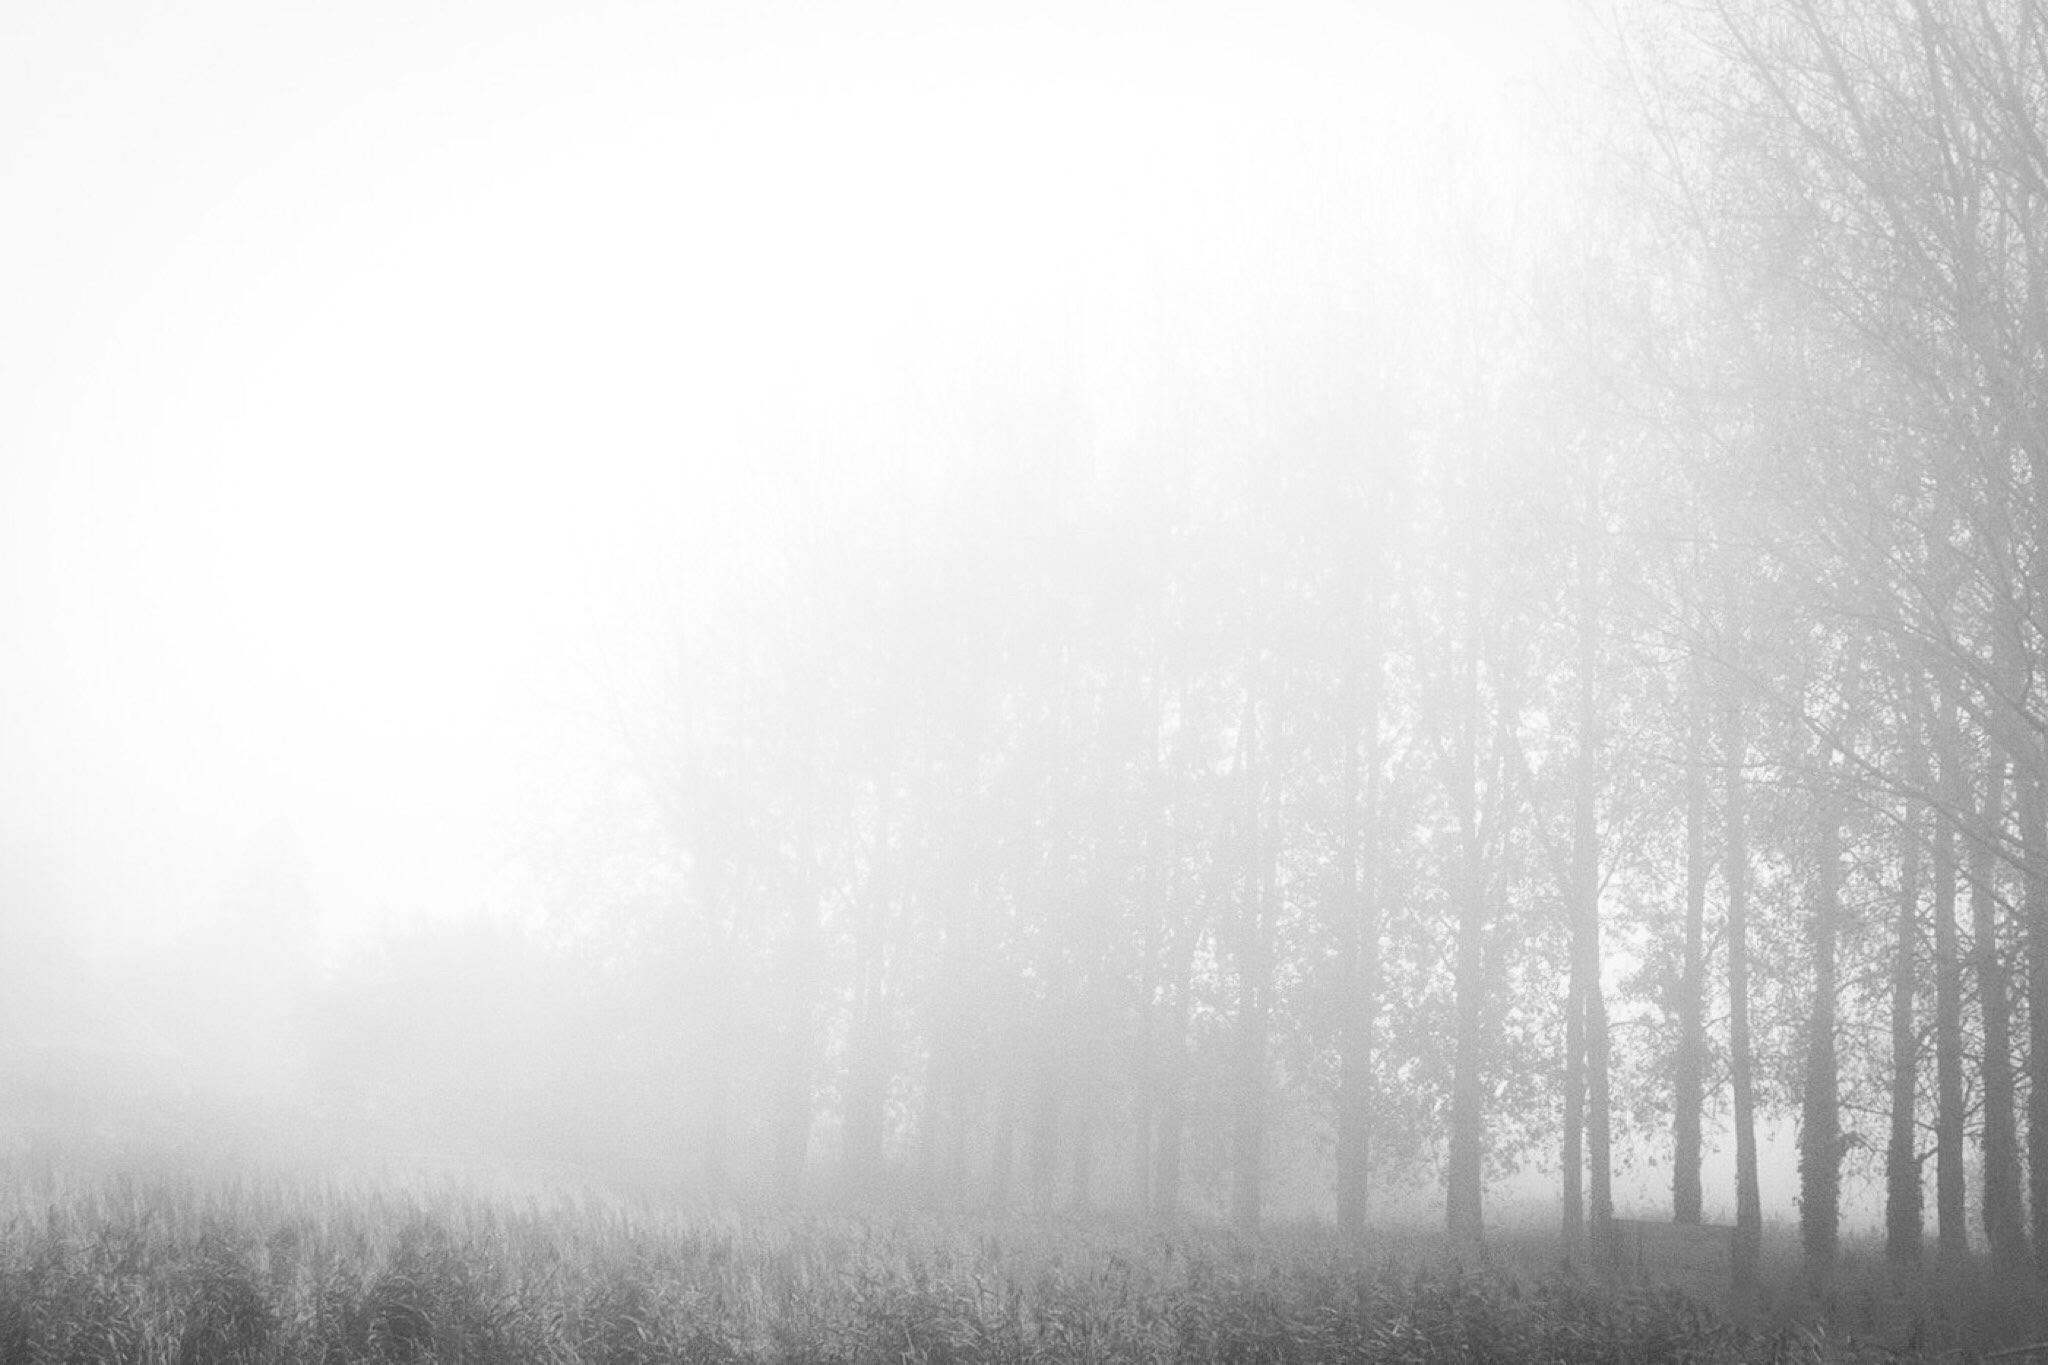 Trees near Wareham by Rick McEvoy landscape photographer in Dorset